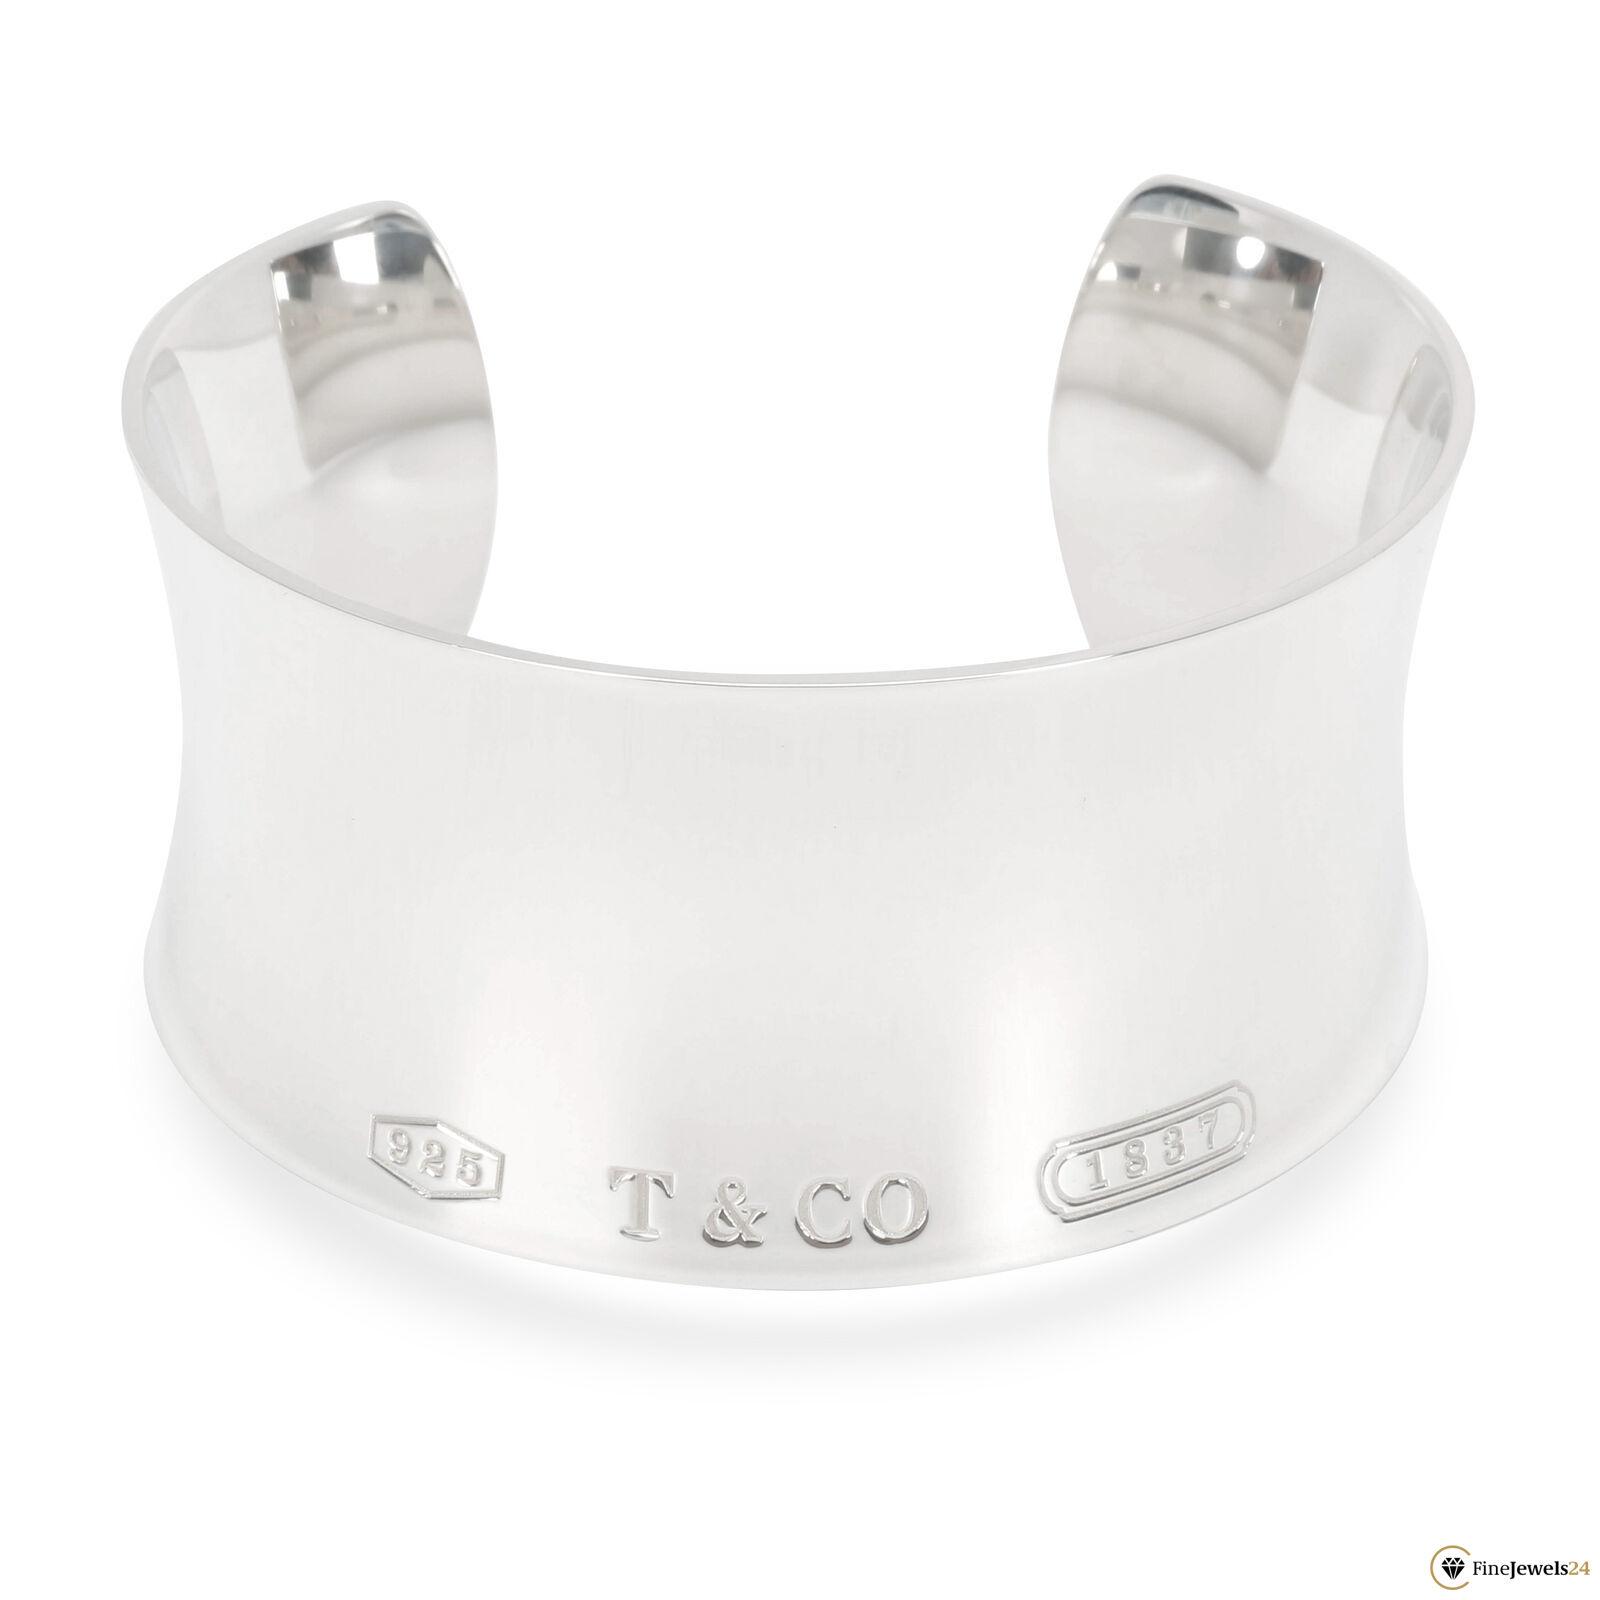 Ring von Tiffany & Co. aus 925er-Sterlingsilber